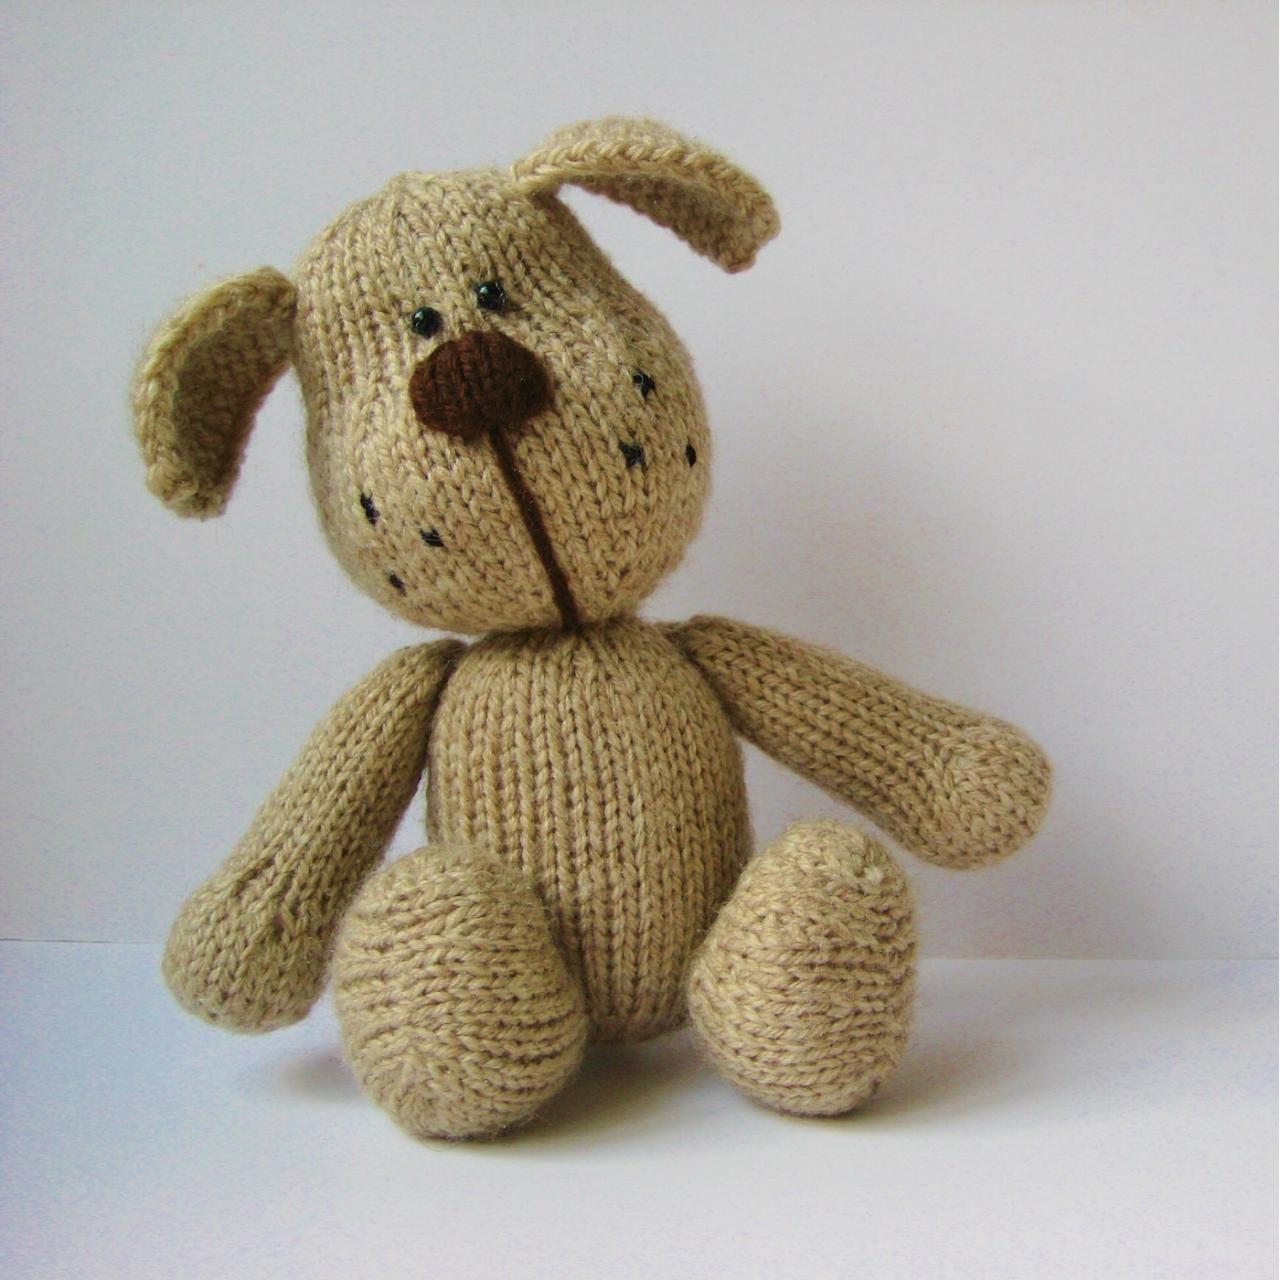 Bernie The Dog Toy Knitting Pattern Baby Present Ideas Pinterest